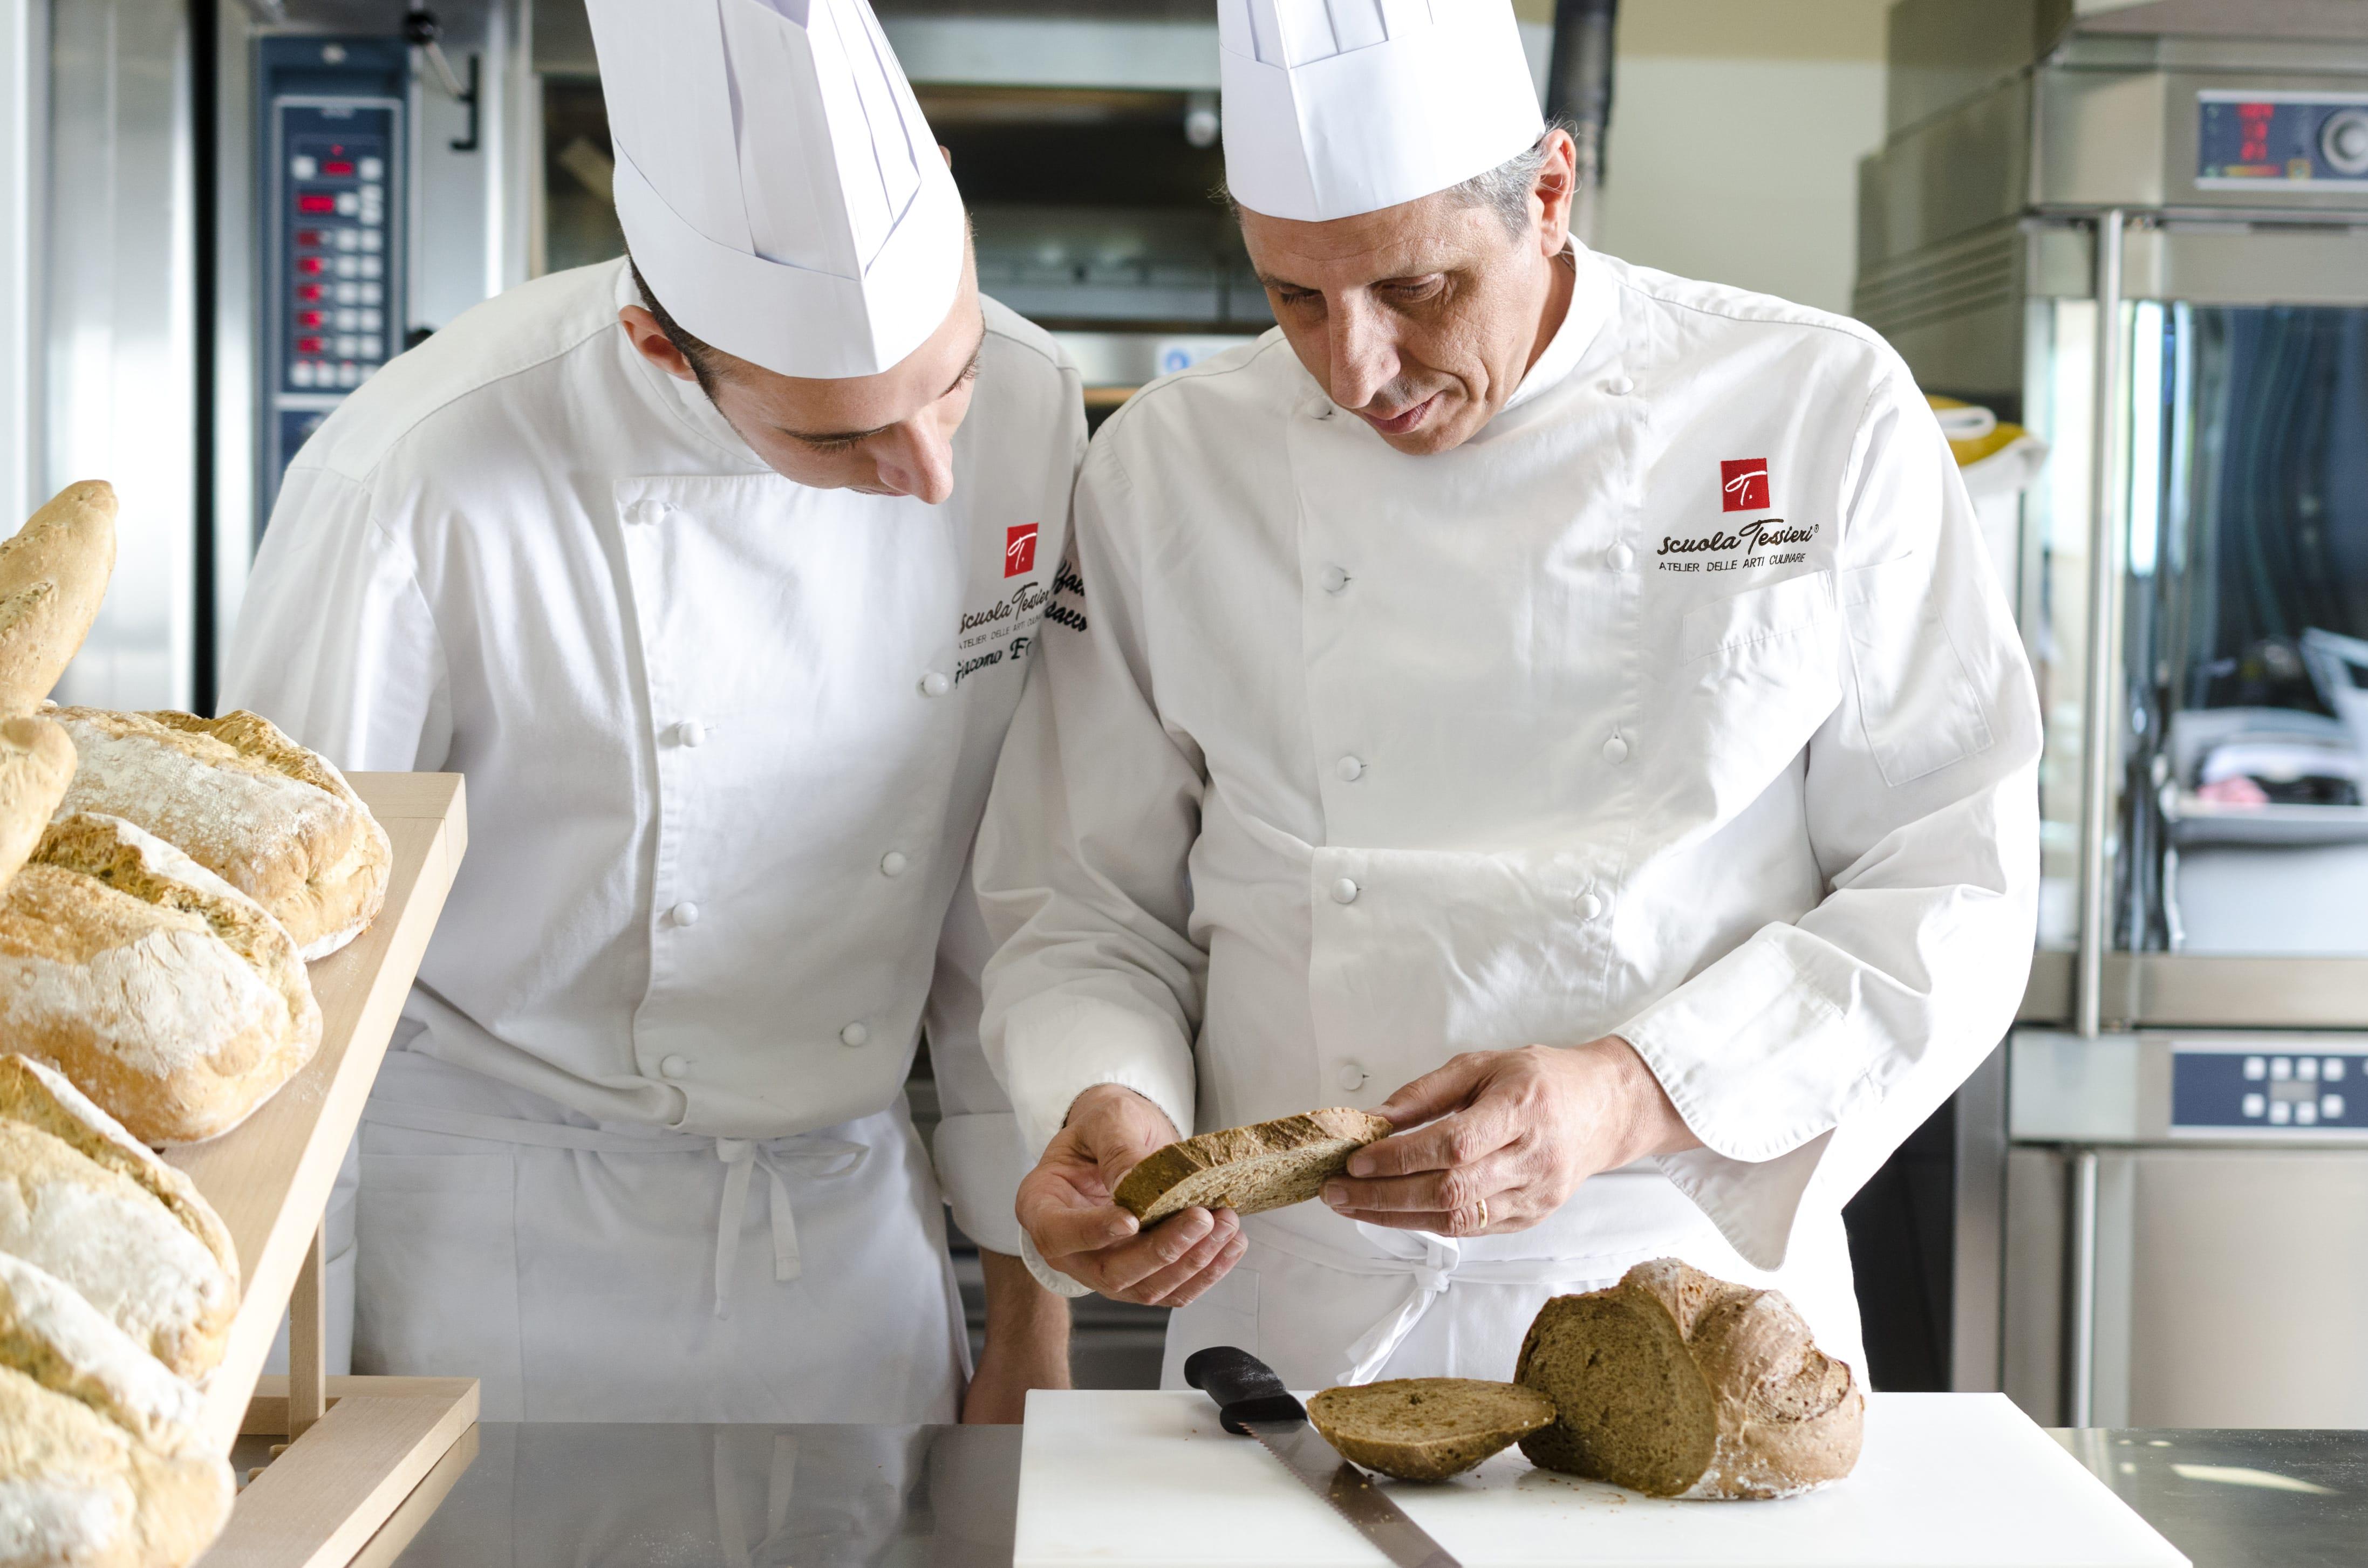 Scuola tessieri la tua scuola di cucina in toscana - Scuola di cucina firenze ...